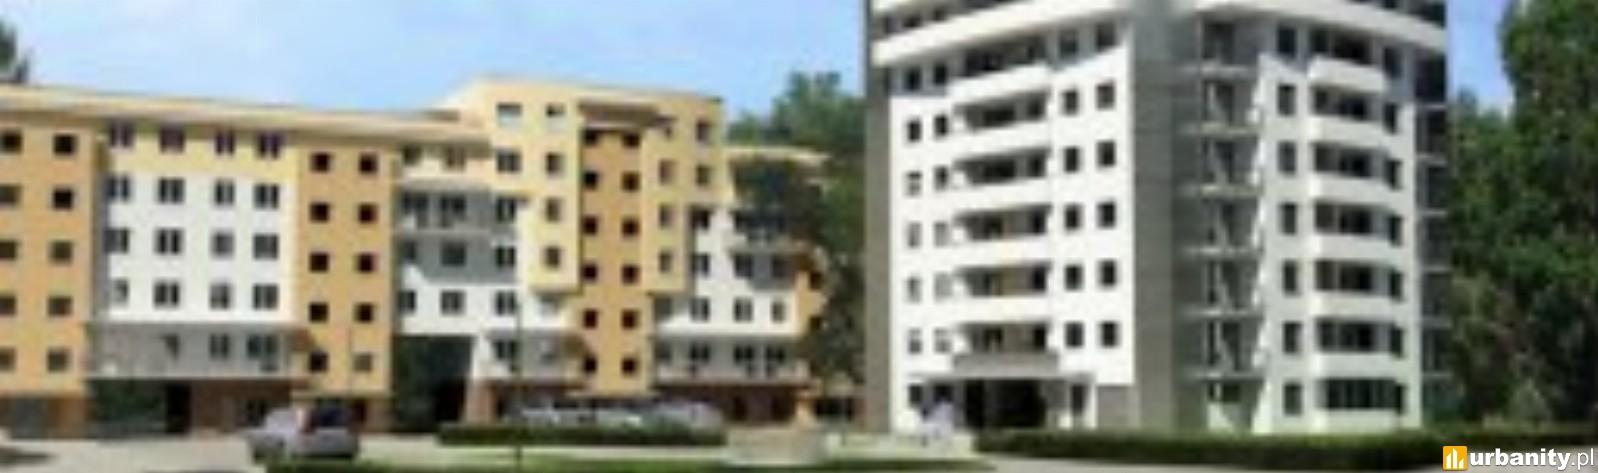 Miniaturka Centrum Mieszkaniowe Żelazna